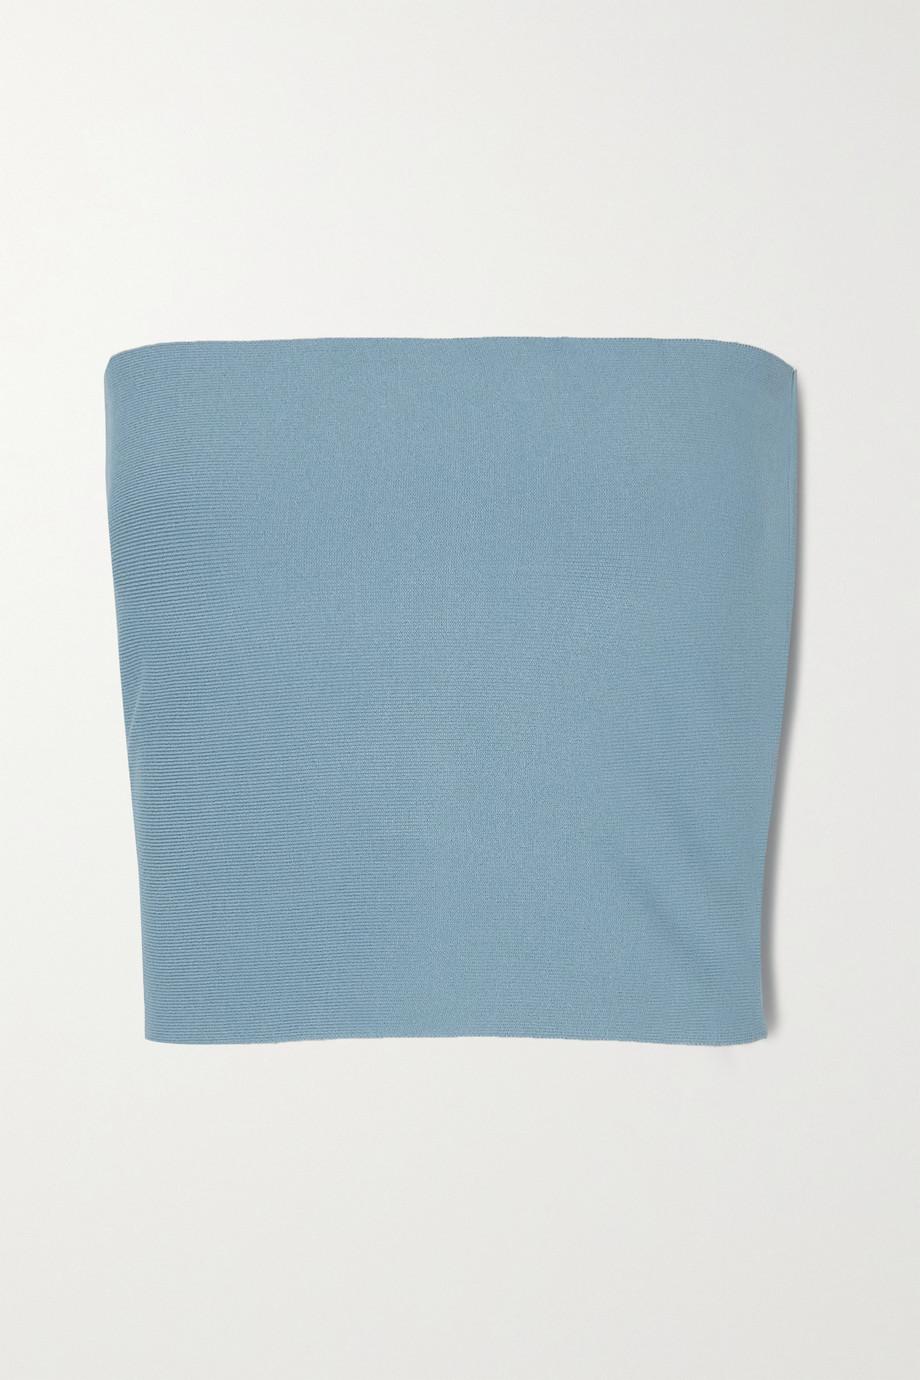 Stella McCartney Stretch-knit bandeau top